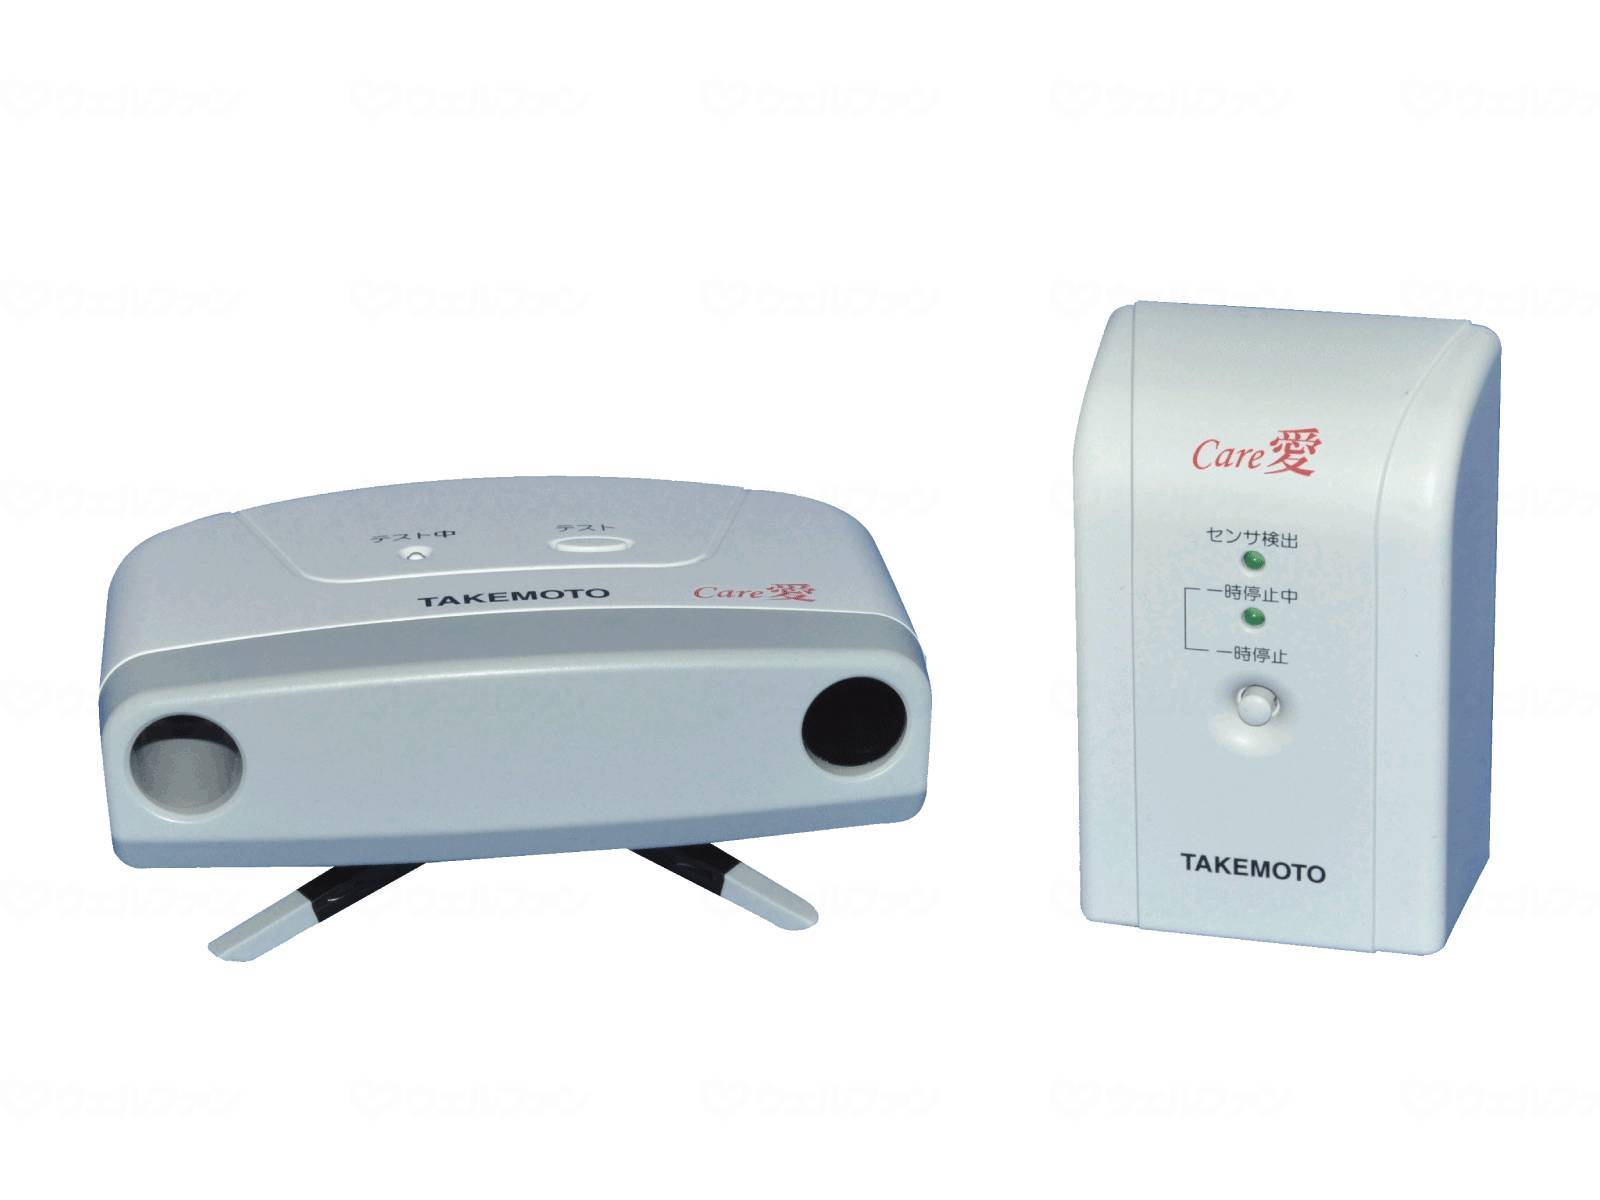 Care愛 超音波離床センサー(無線タイプ)